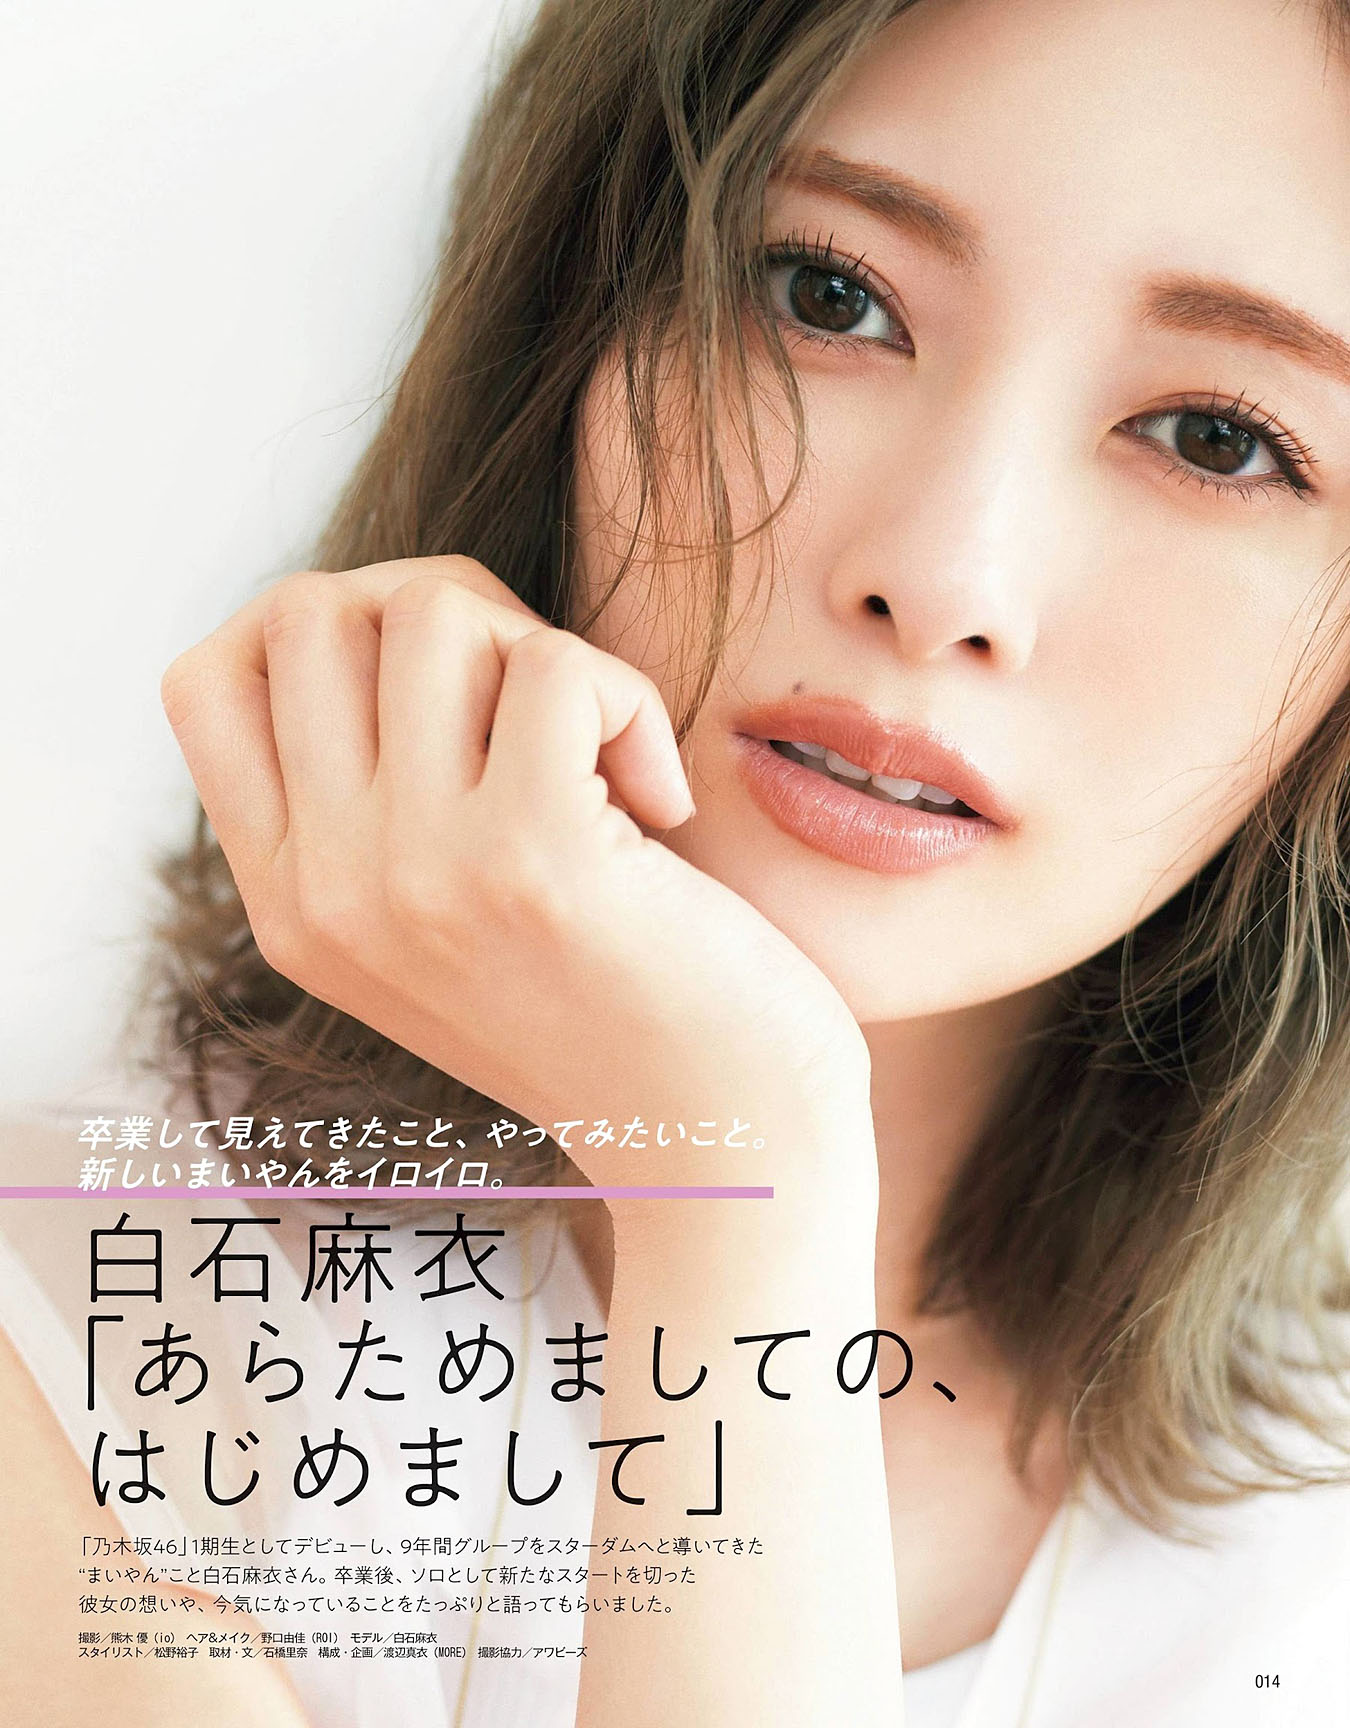 MShiraishi More 2103 02.jpg